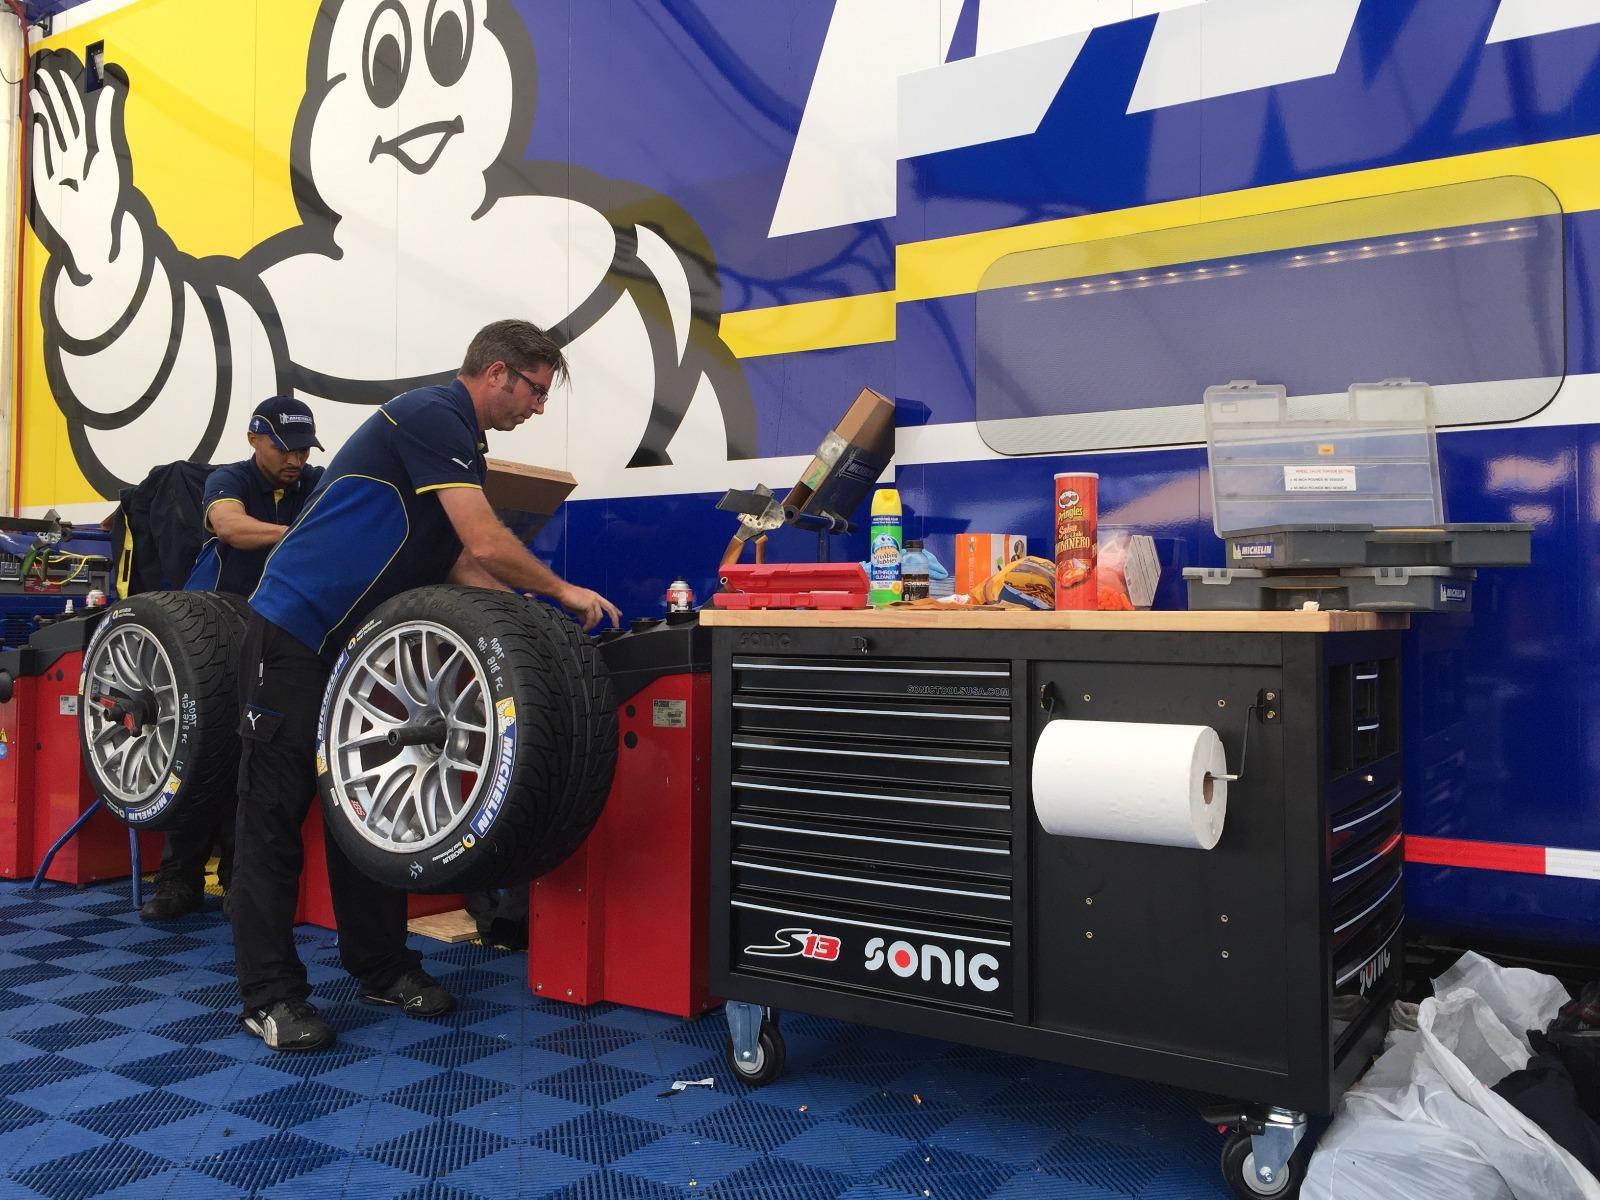 S13工具箱在比赛团队研讨会中yabo时时彩